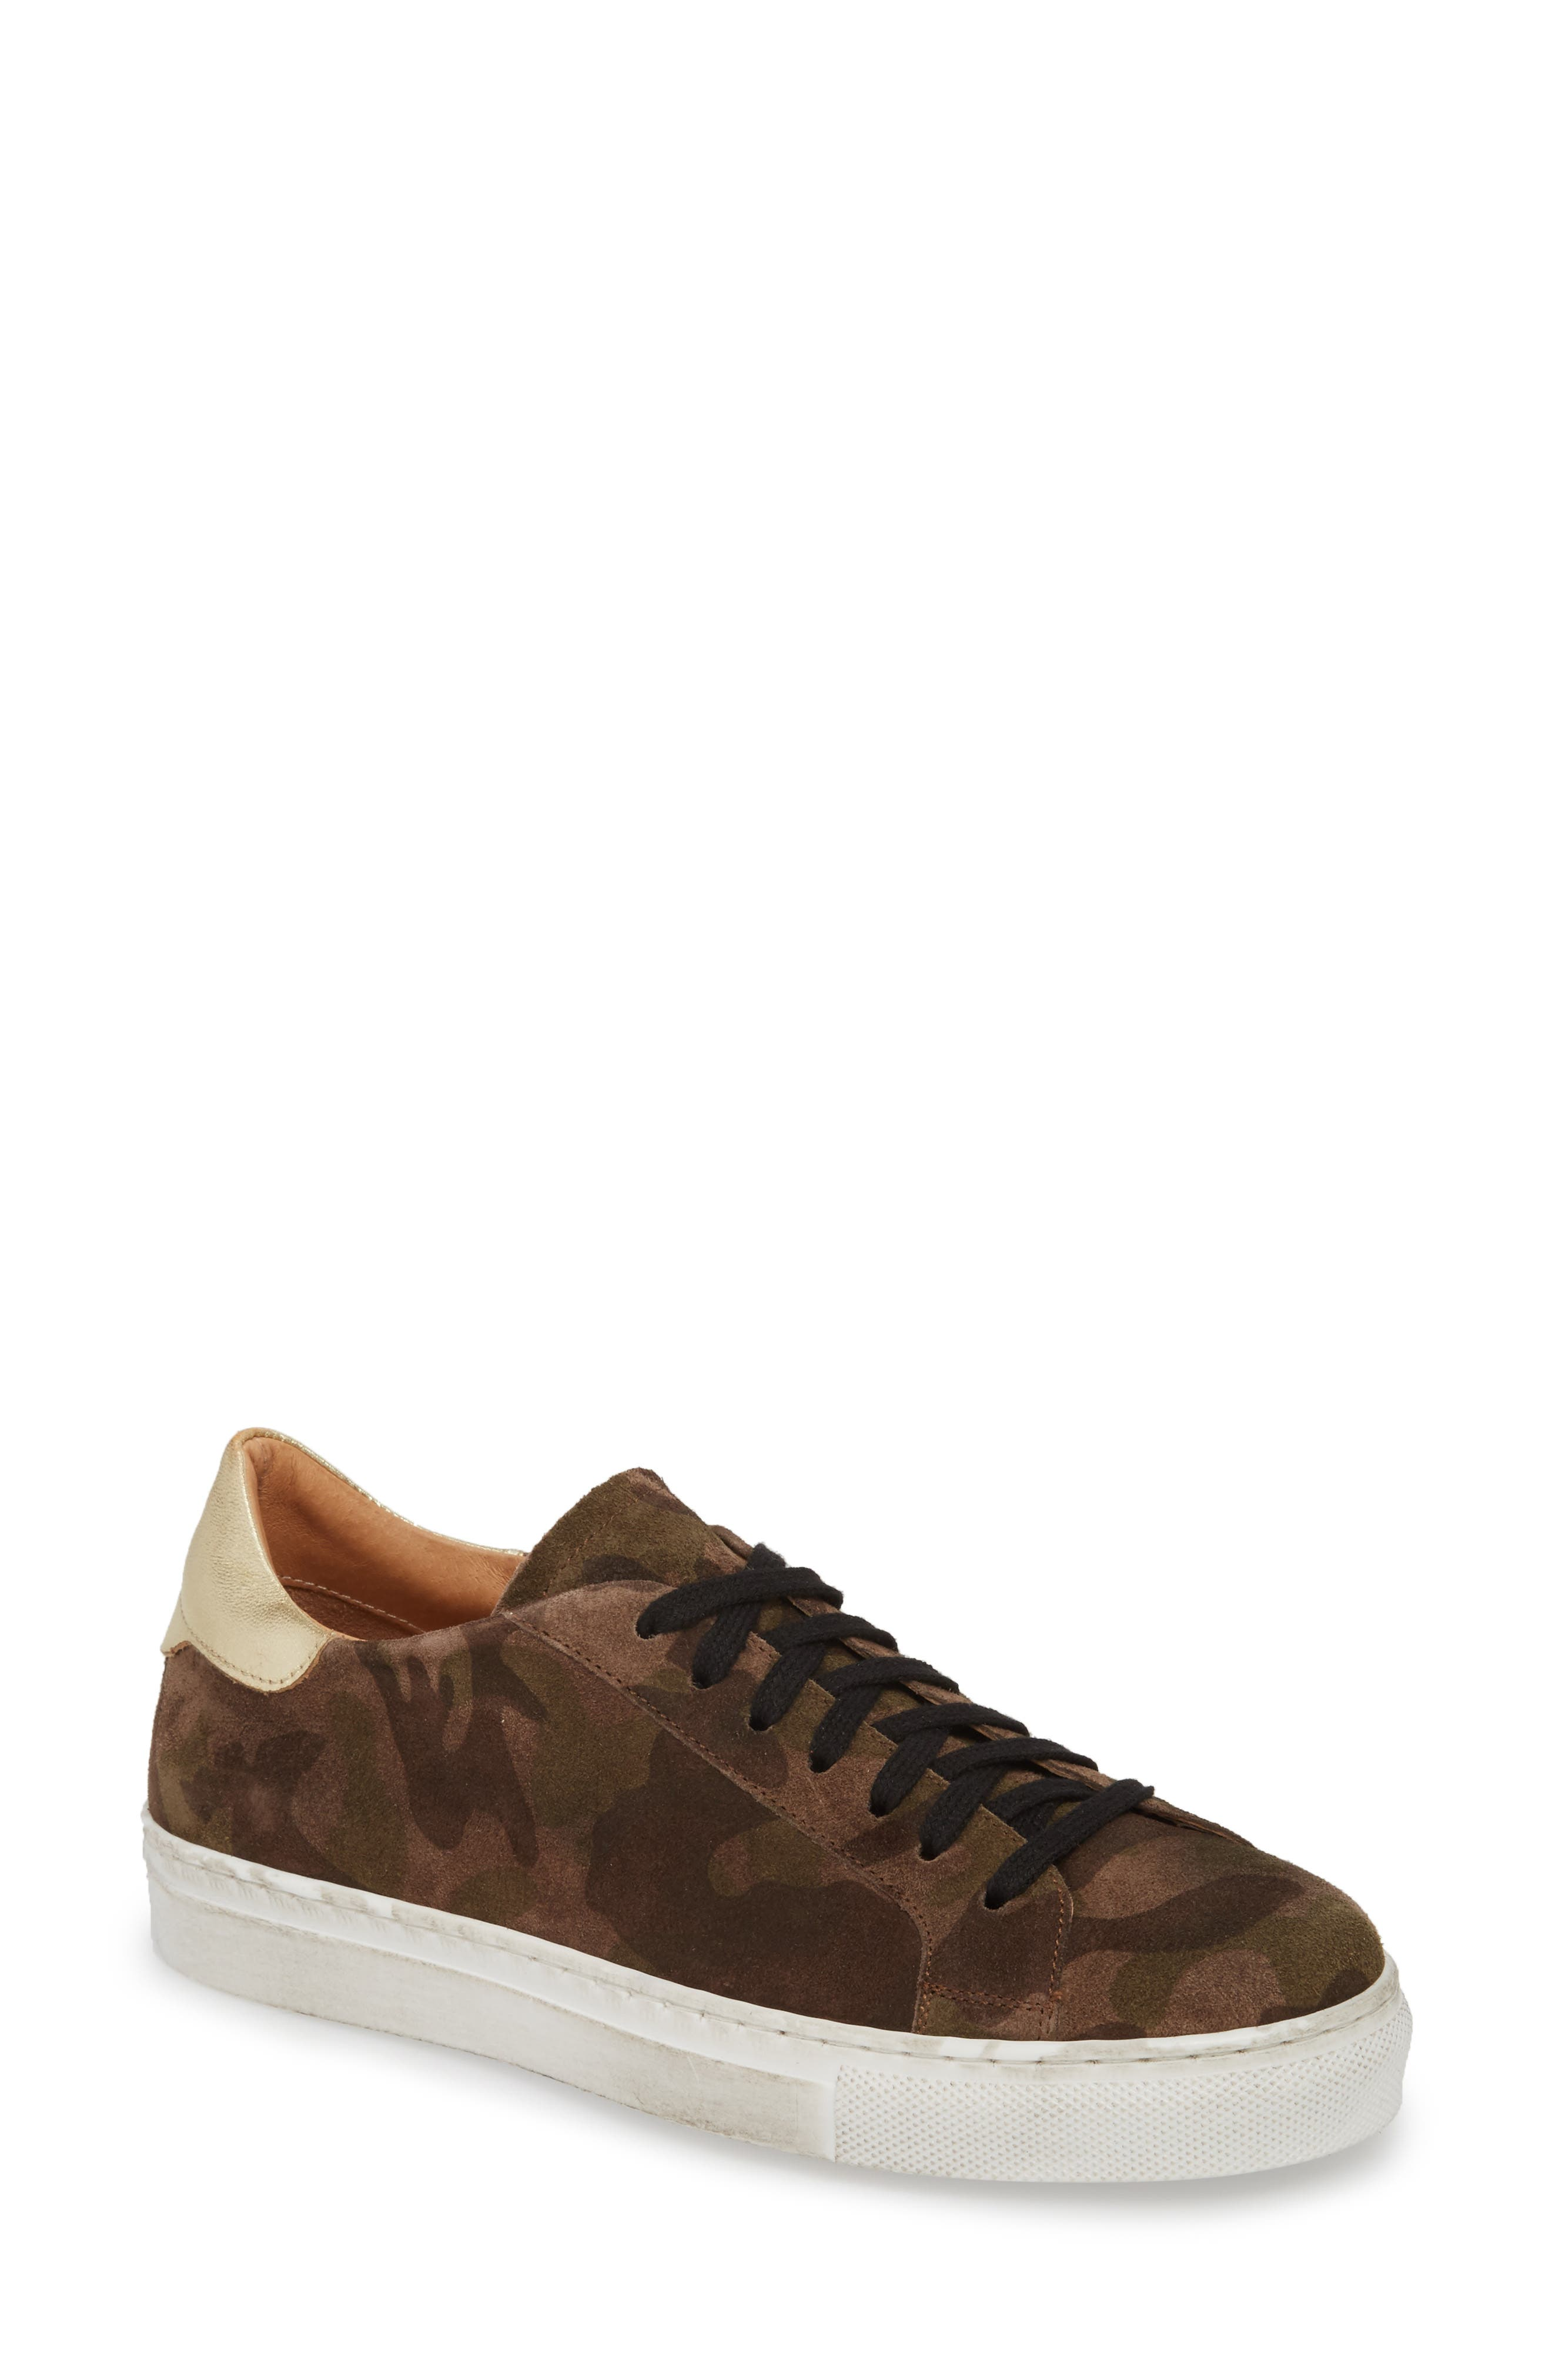 Orissa Sneaker,                             Main thumbnail 1, color,                             MILITARY PRINT SUEDE